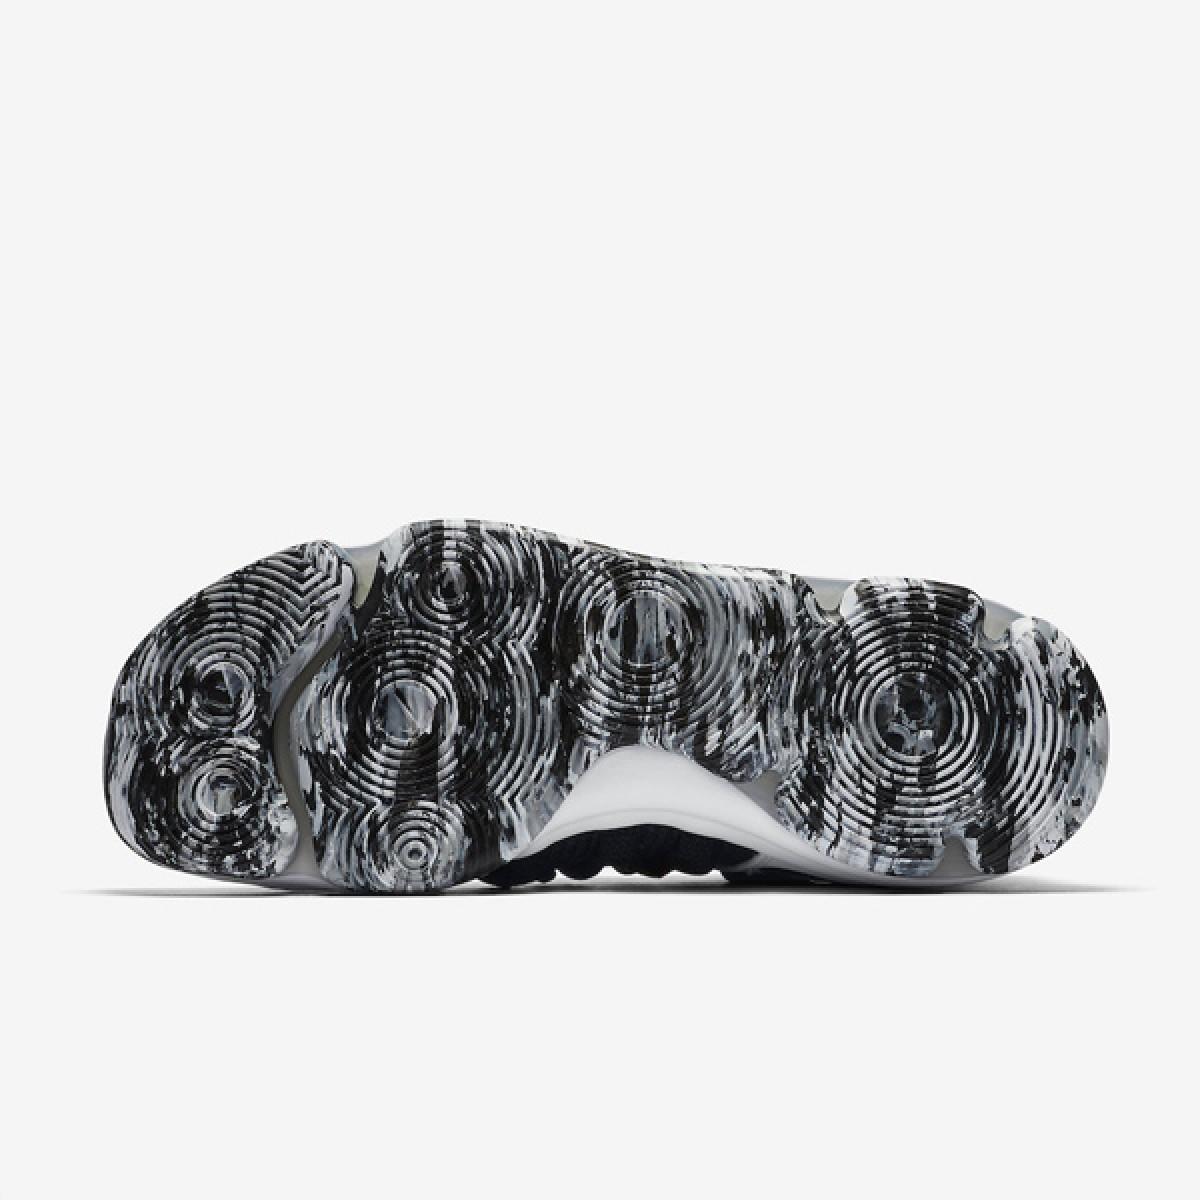 Nike Zoom KD 10 GS 'Dirty Sole' 918365-008